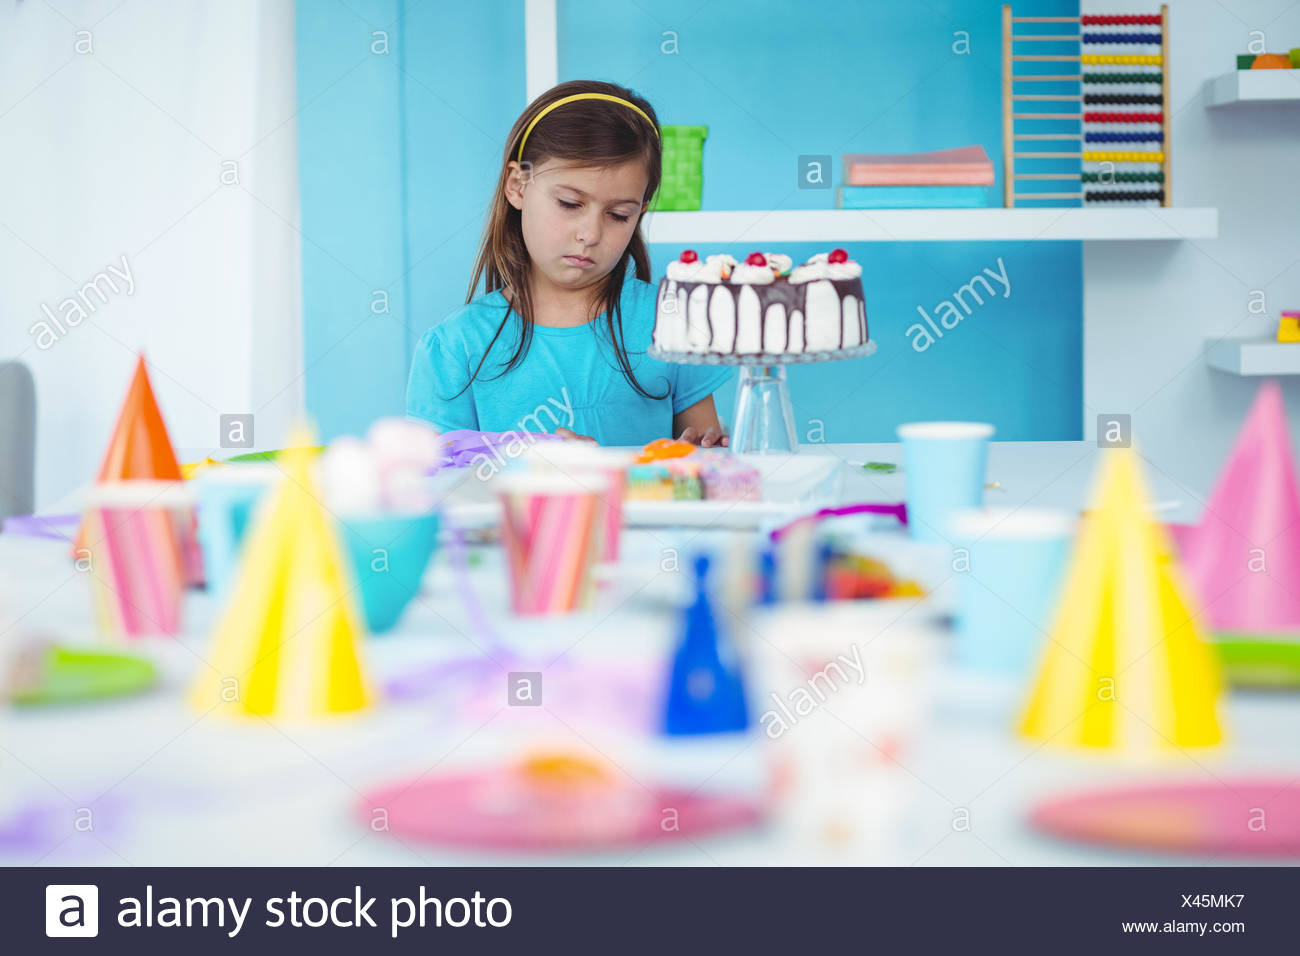 Sad Kid Alone At Her Birthday